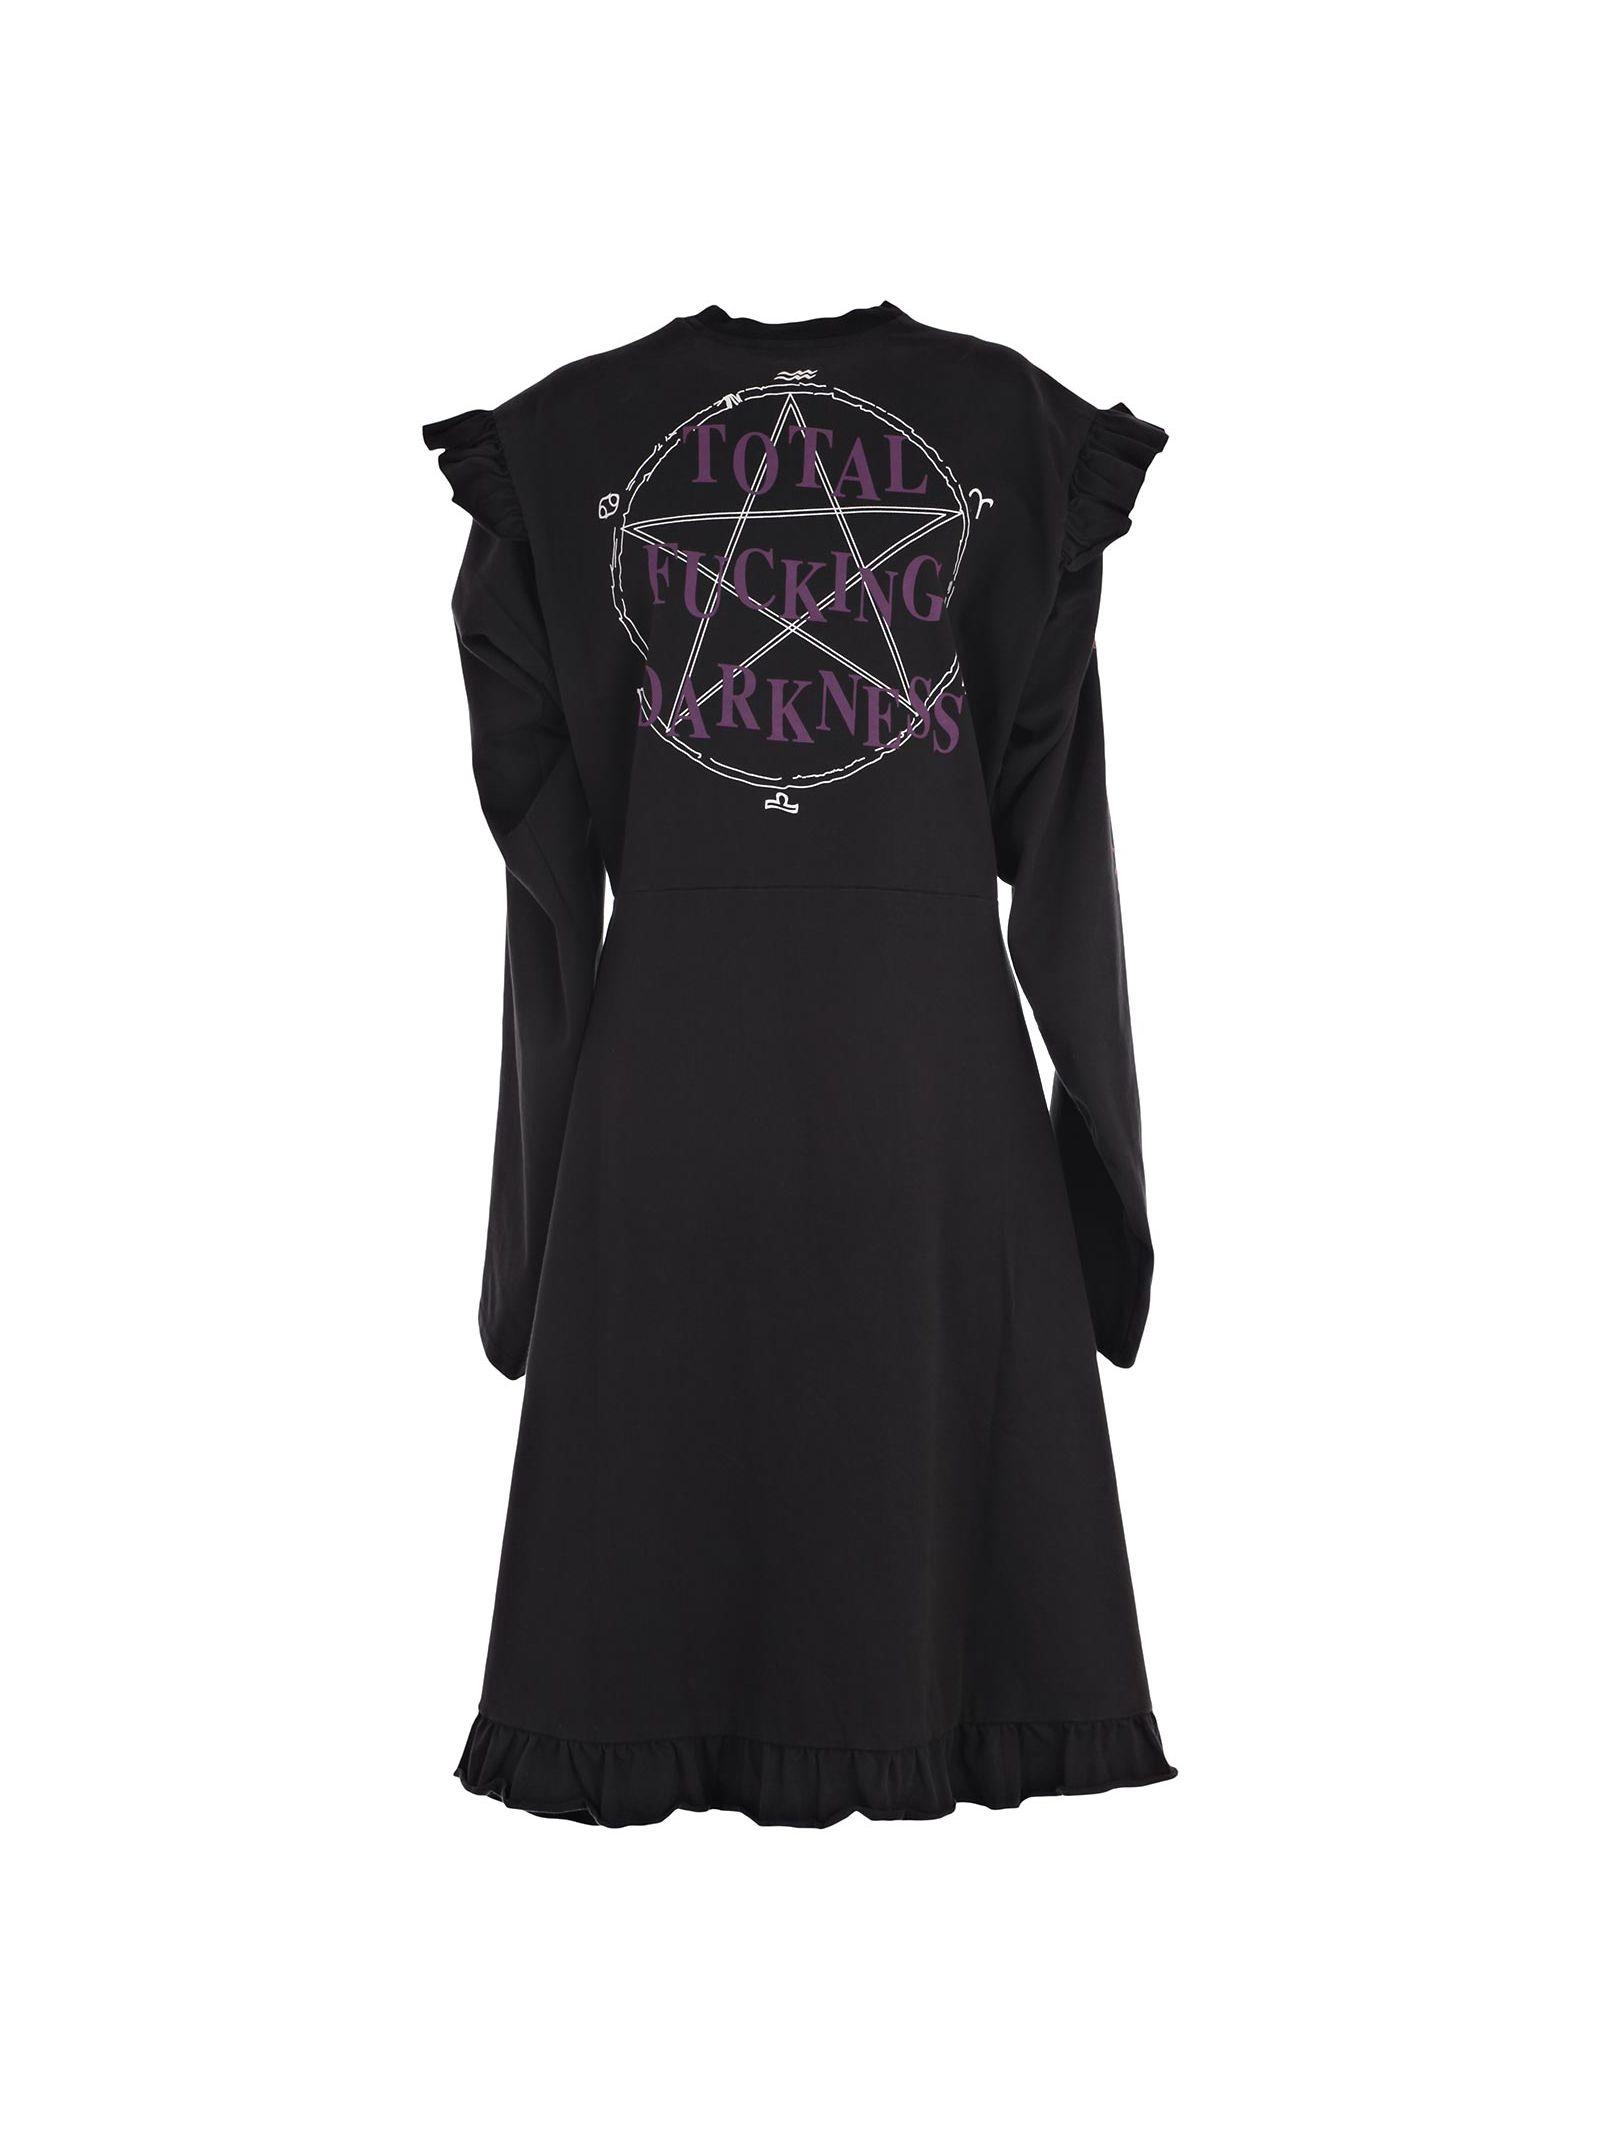 Dress From Vetements: Black Print Cotton Dress